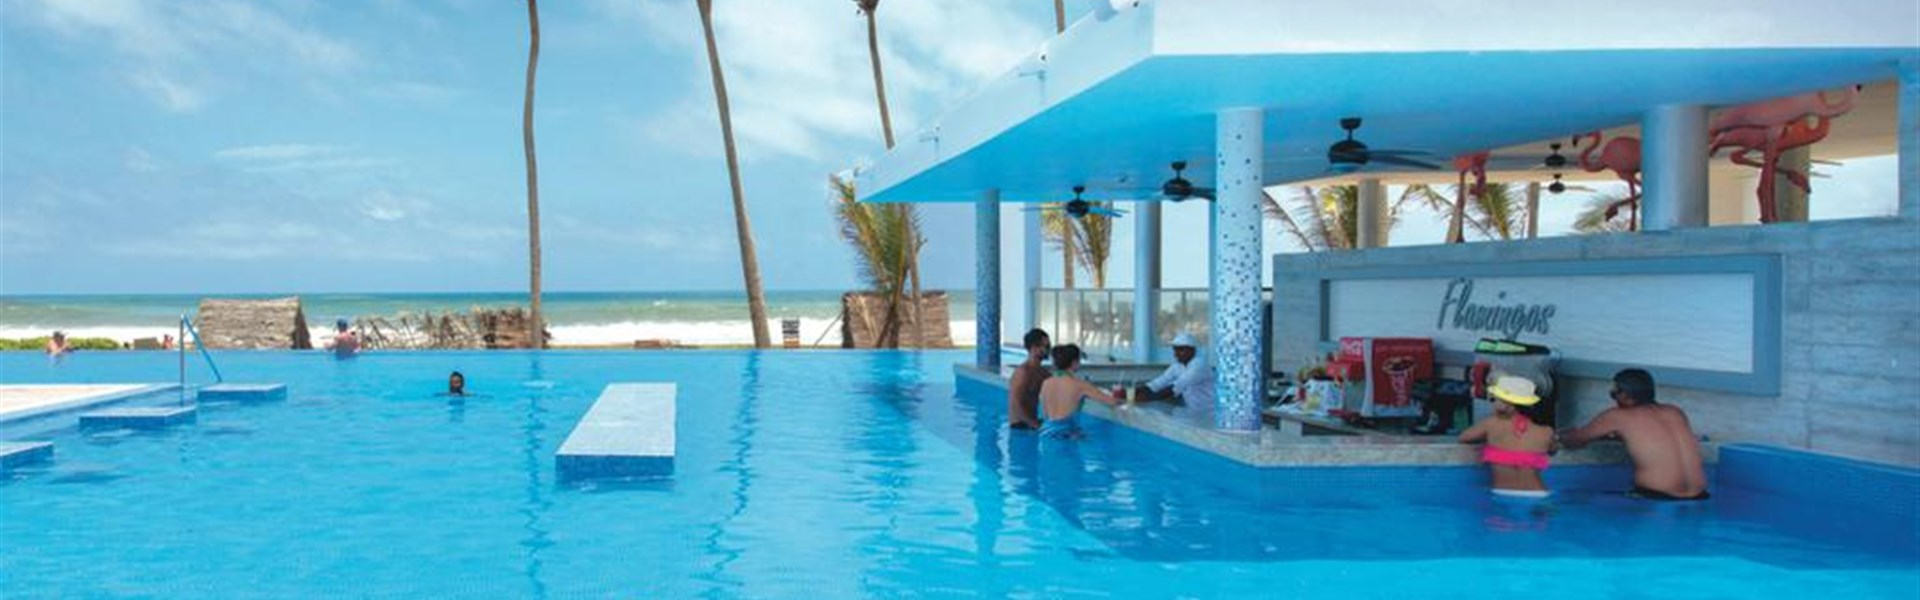 Pobyt u moře - Bentota - RIU (5*) - all inclusive - RIU Ahungalla